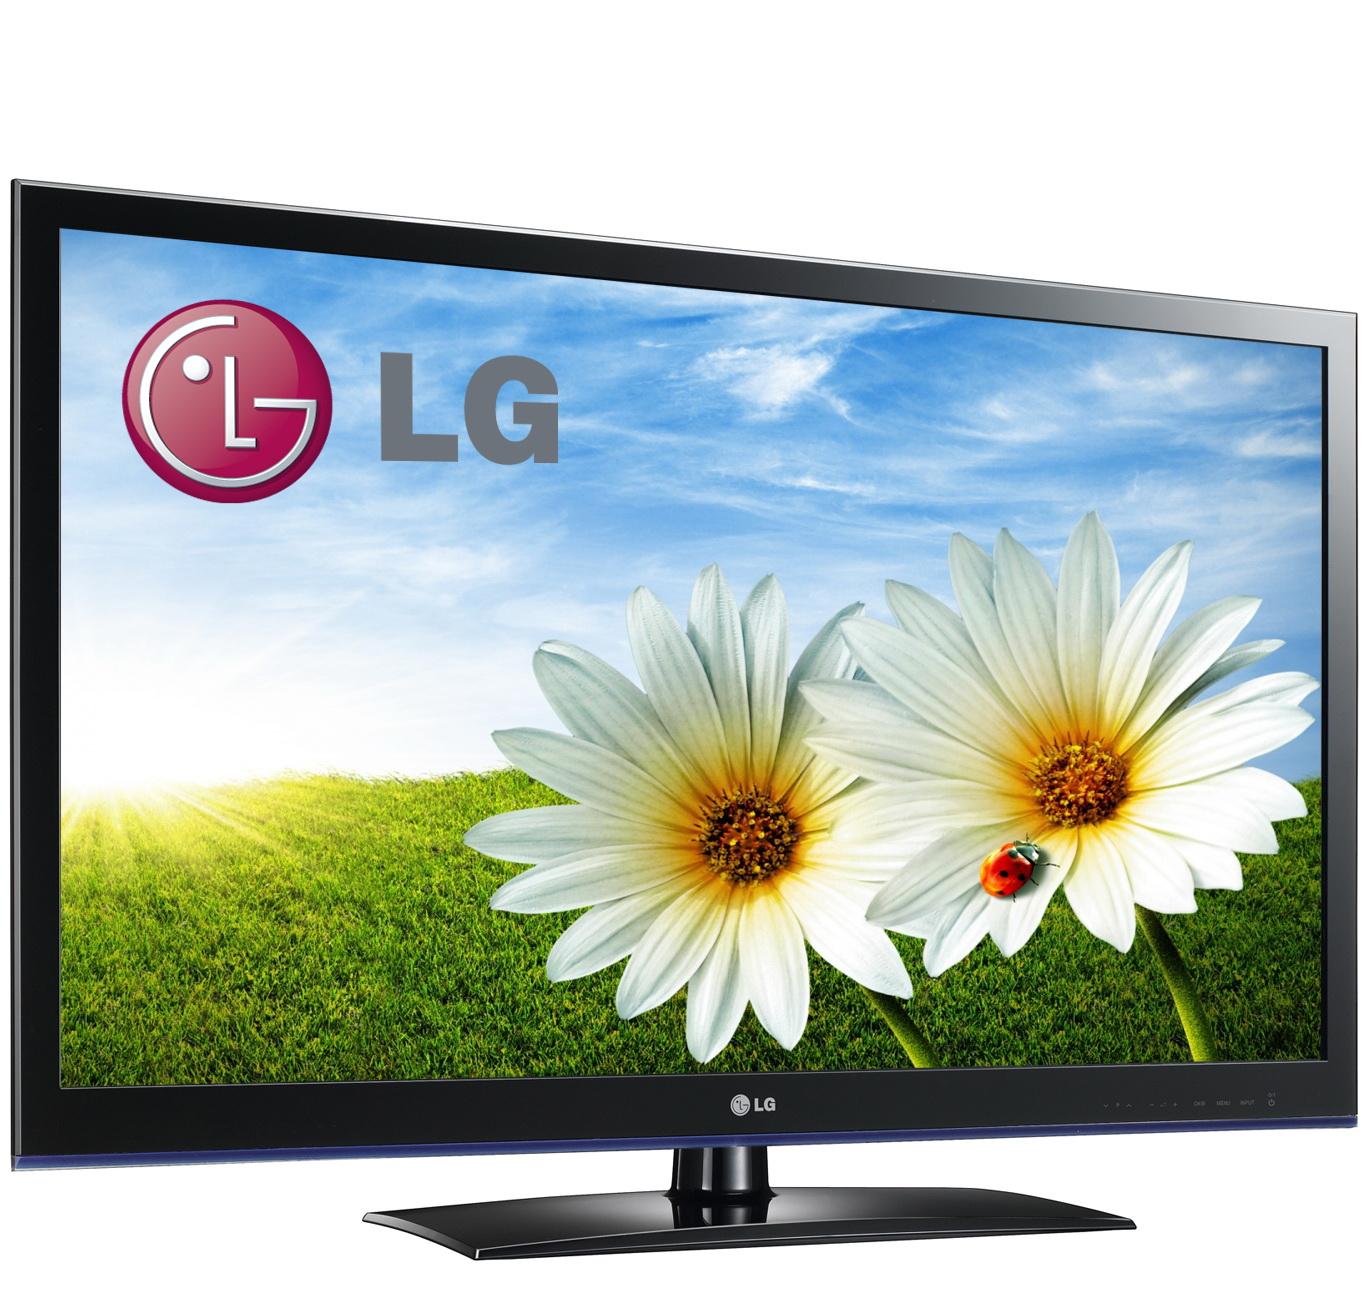 Harga Tv Lg Itb2cstore